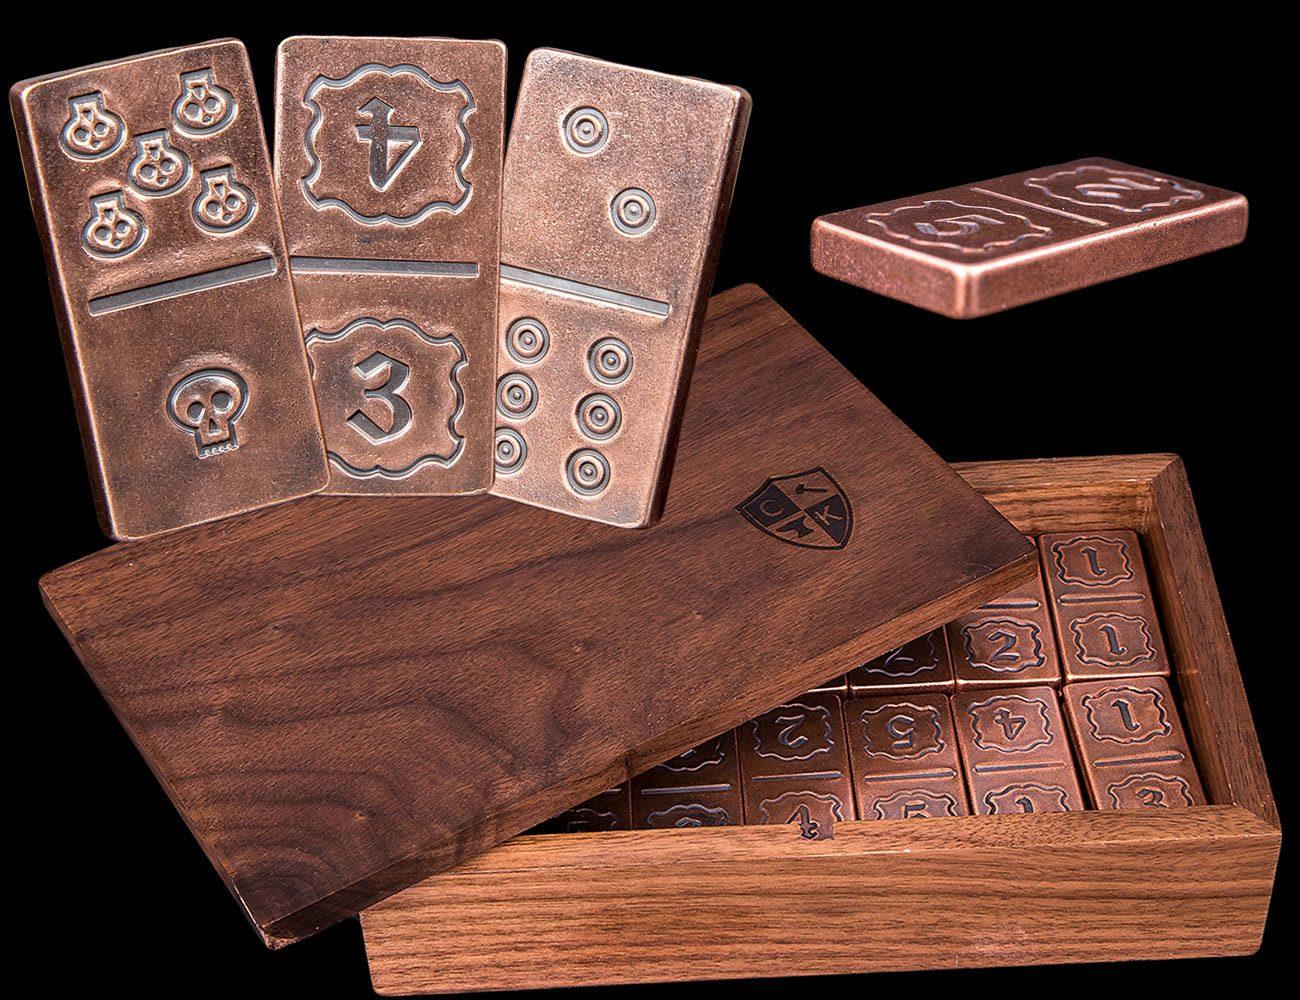 Handmade+Solid+Copper+Metal+Domino+Game+Set+In+Box+%26amp%3B+Dice